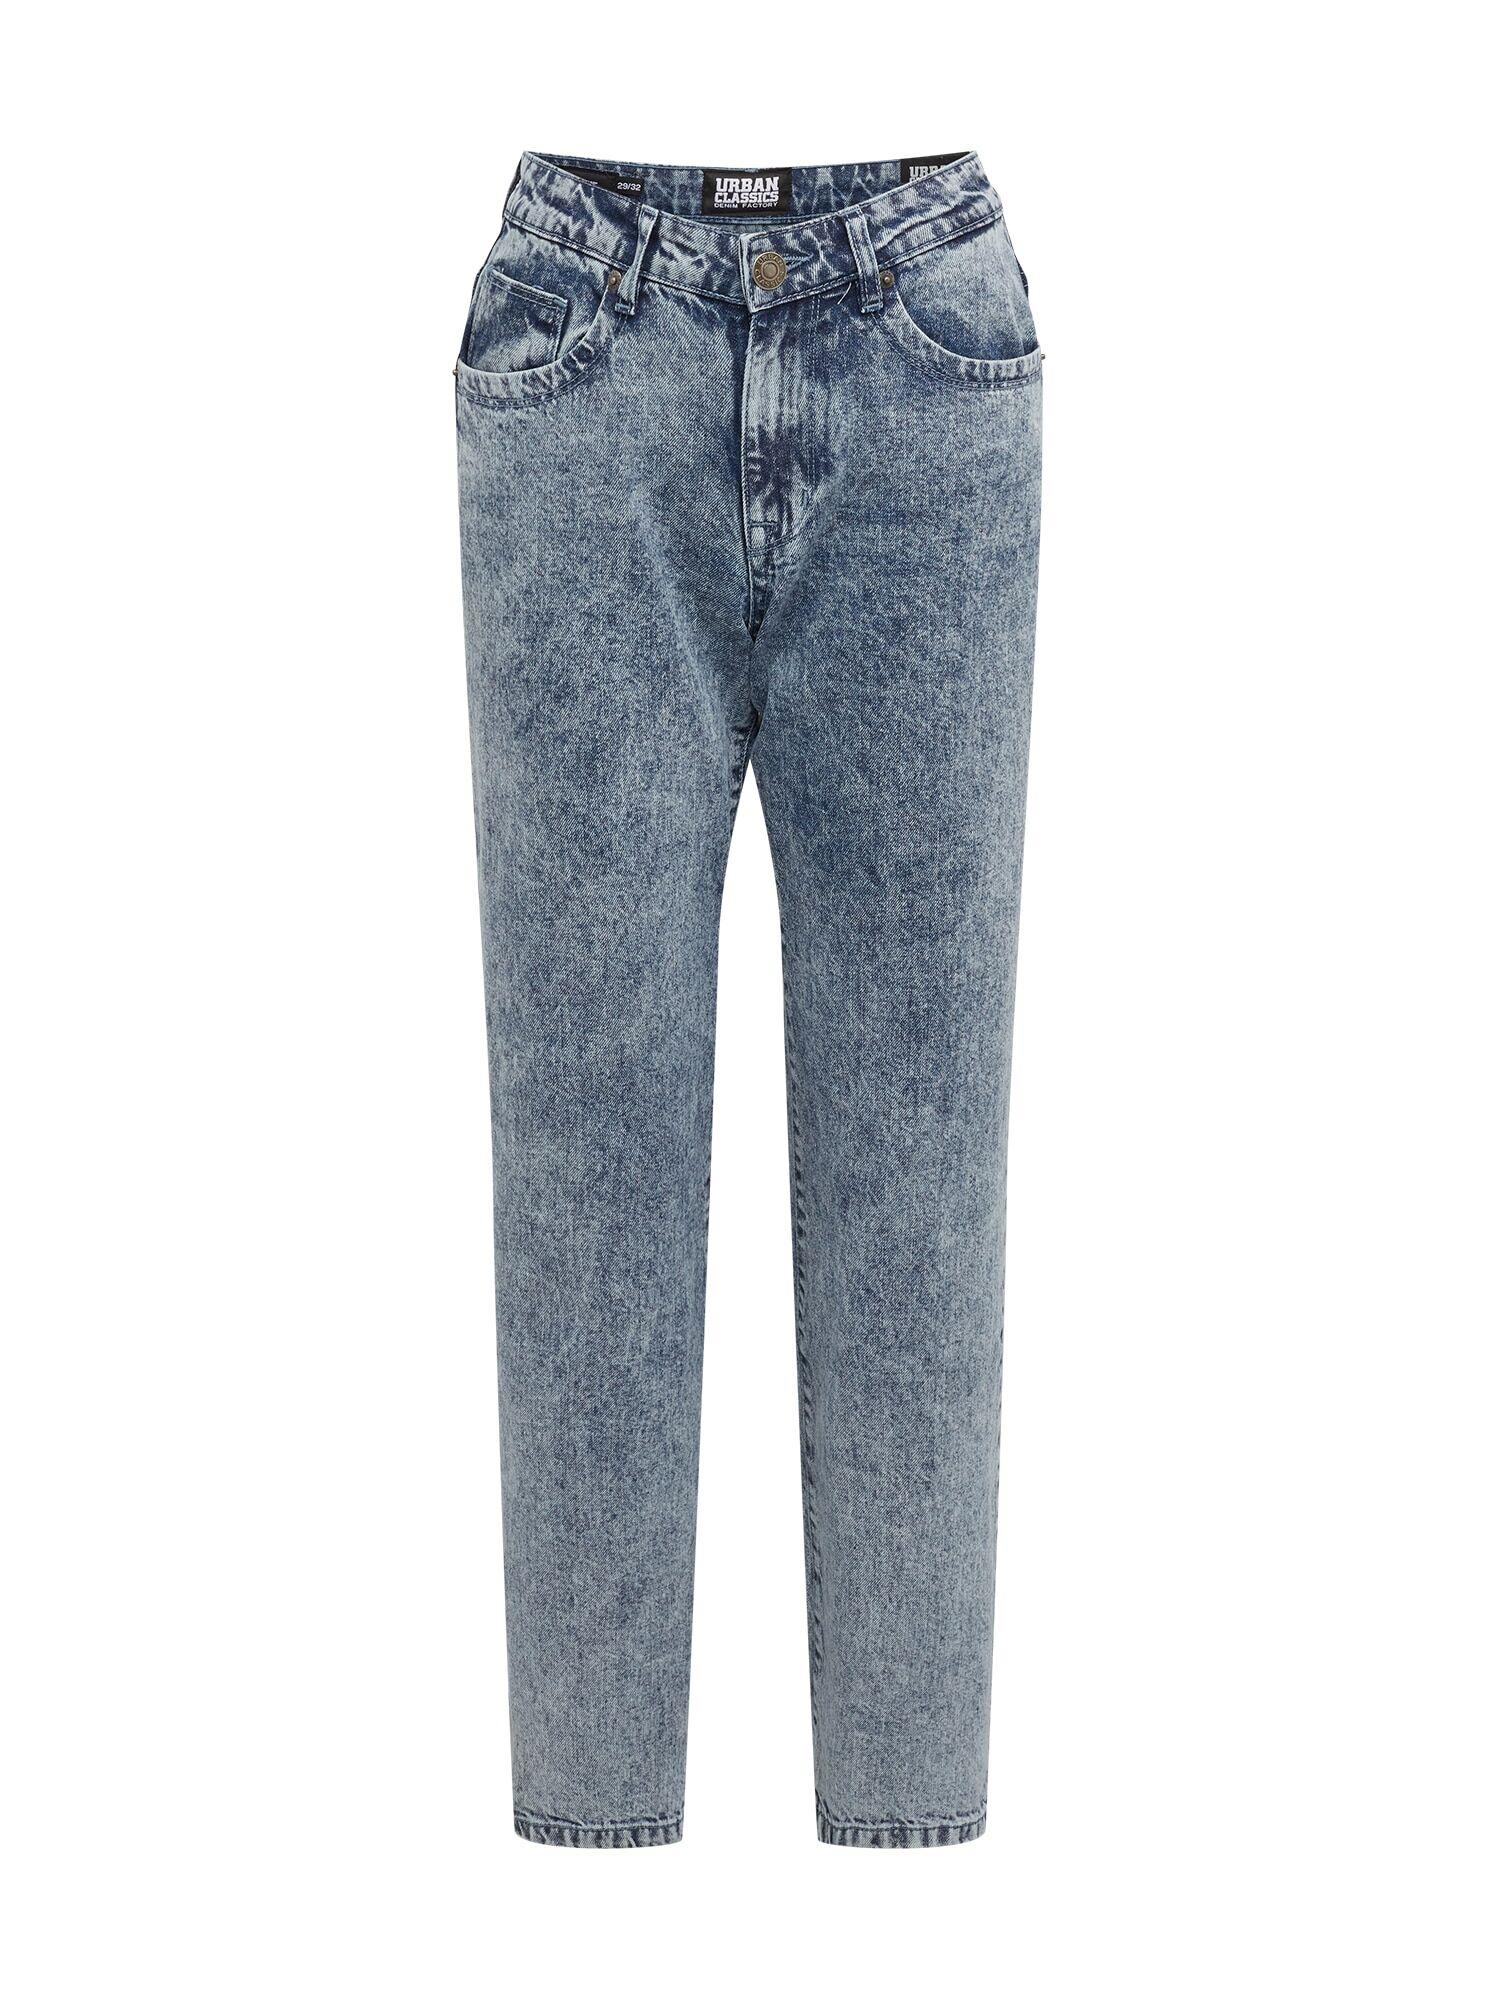 Urban Classics Jean  - Bleu - Taille: 33 - male